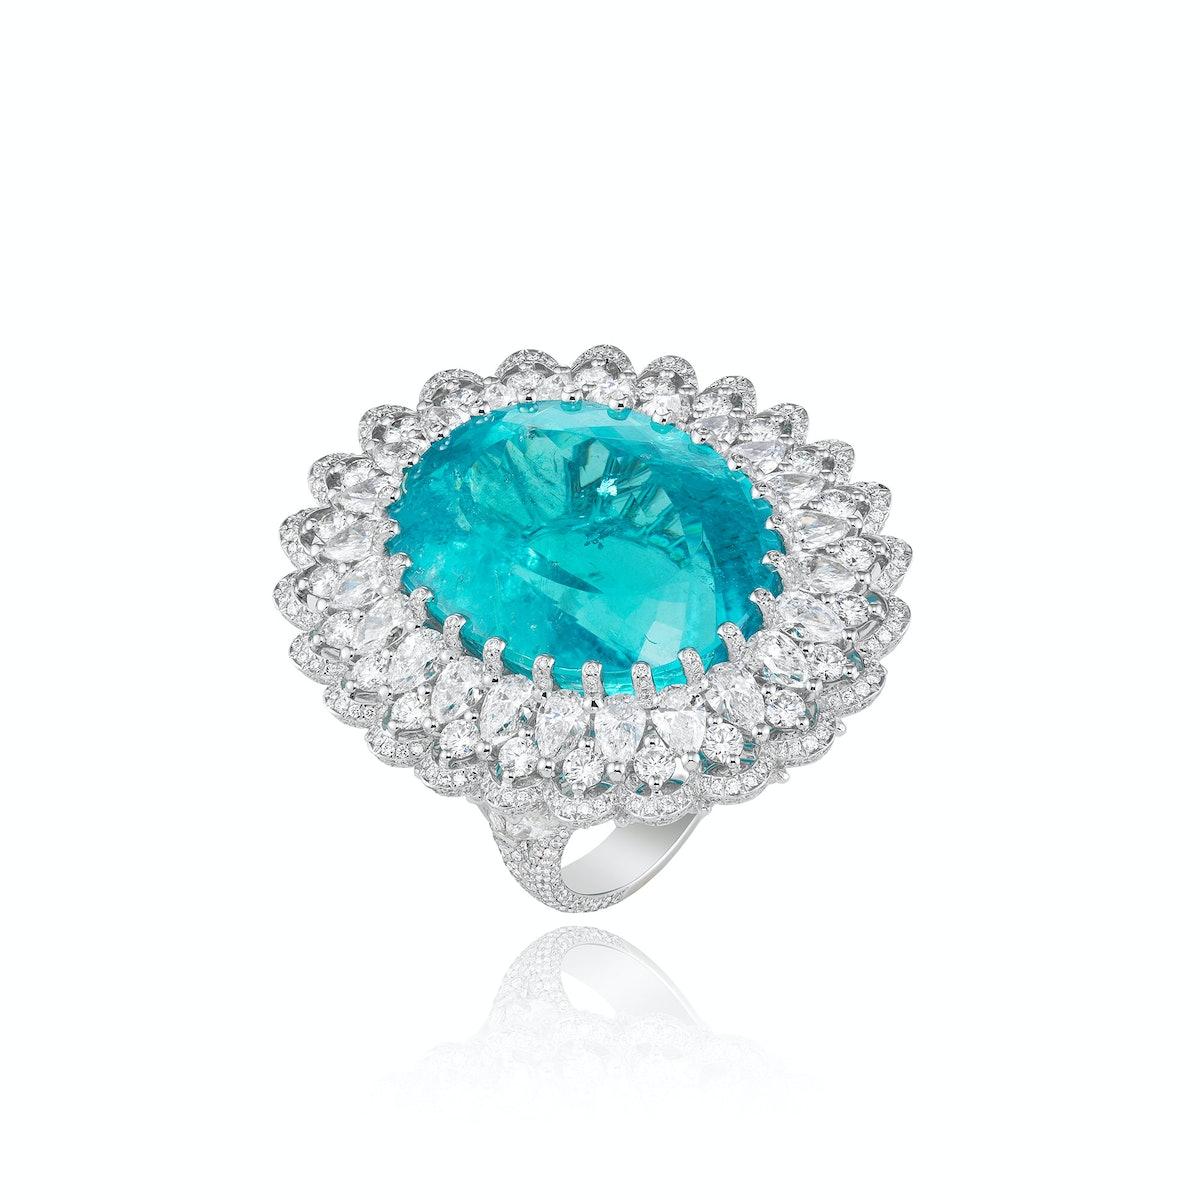 Chopard-Fine-Jewelry-41.57-Carat-Paraiba-Tourmaline-and-Diamond-Ring,-Price-Upon-Request,-at-www.Chopard.com